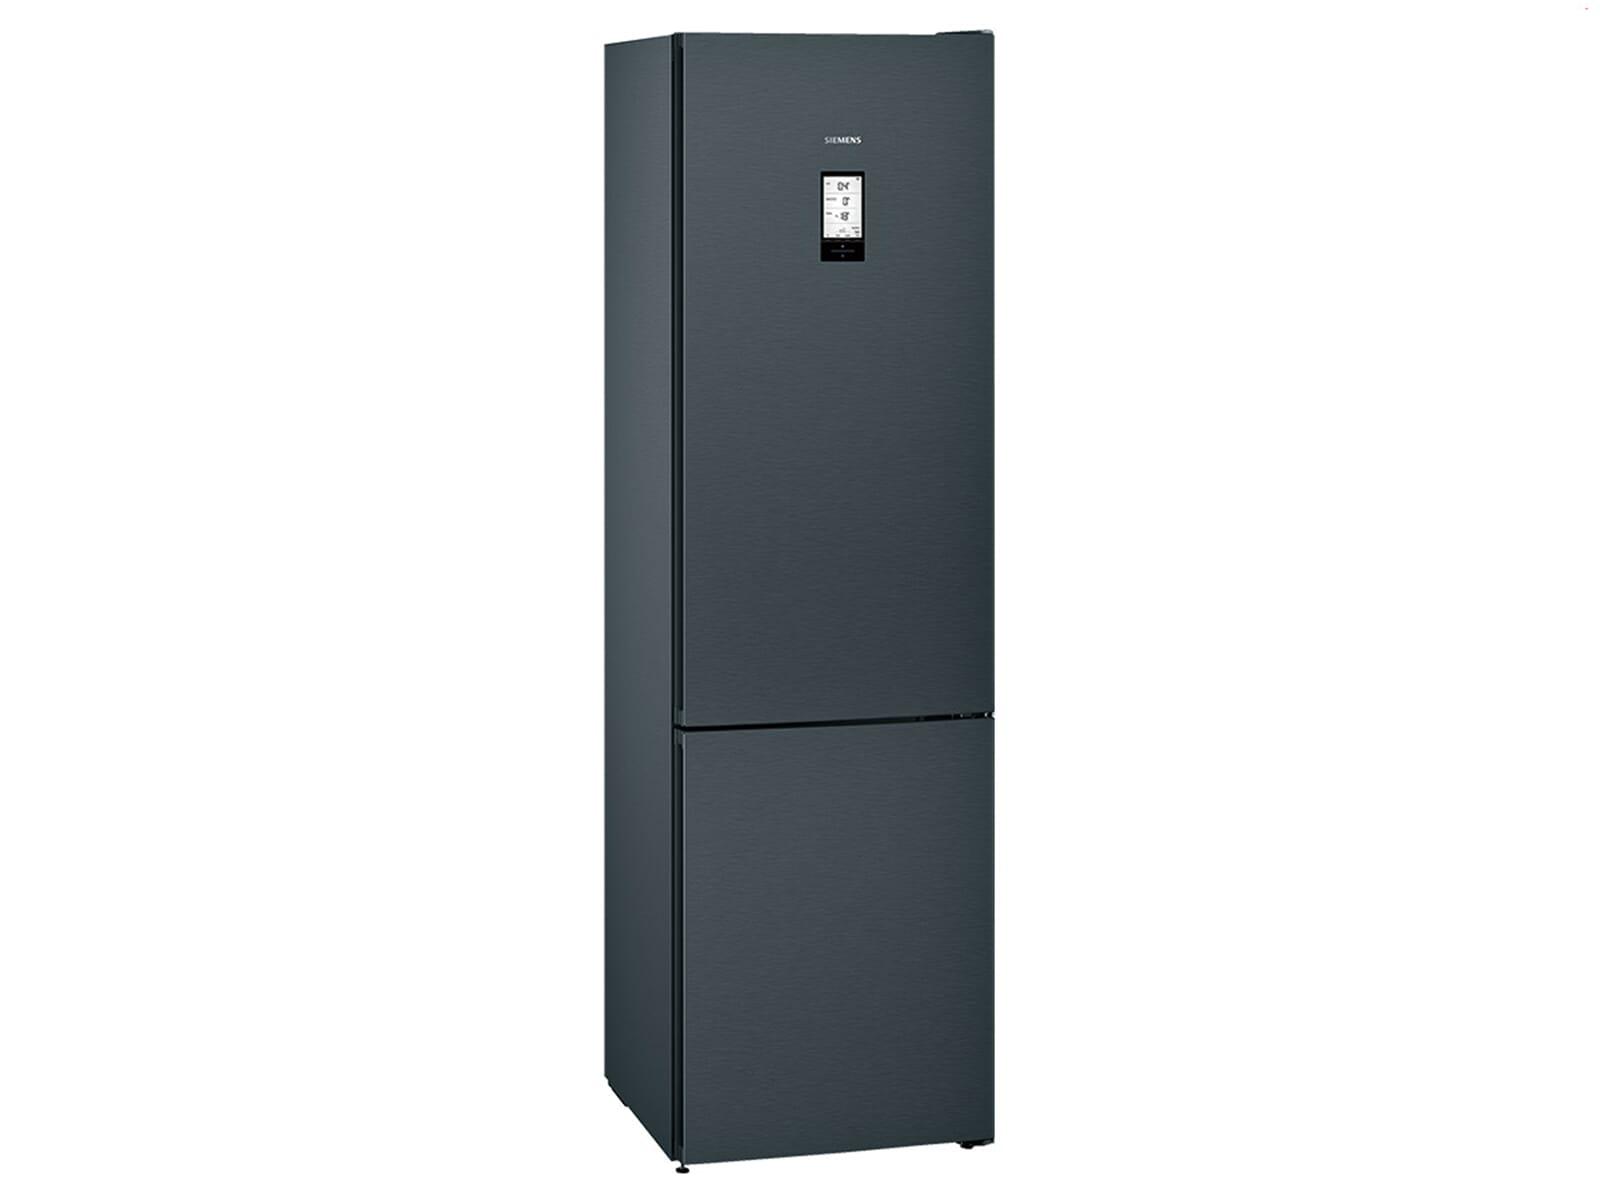 Siemens Kühlschrank Kg36vvl32 : Kühlschrank gefrierkombi unabhängiger einbau kühl